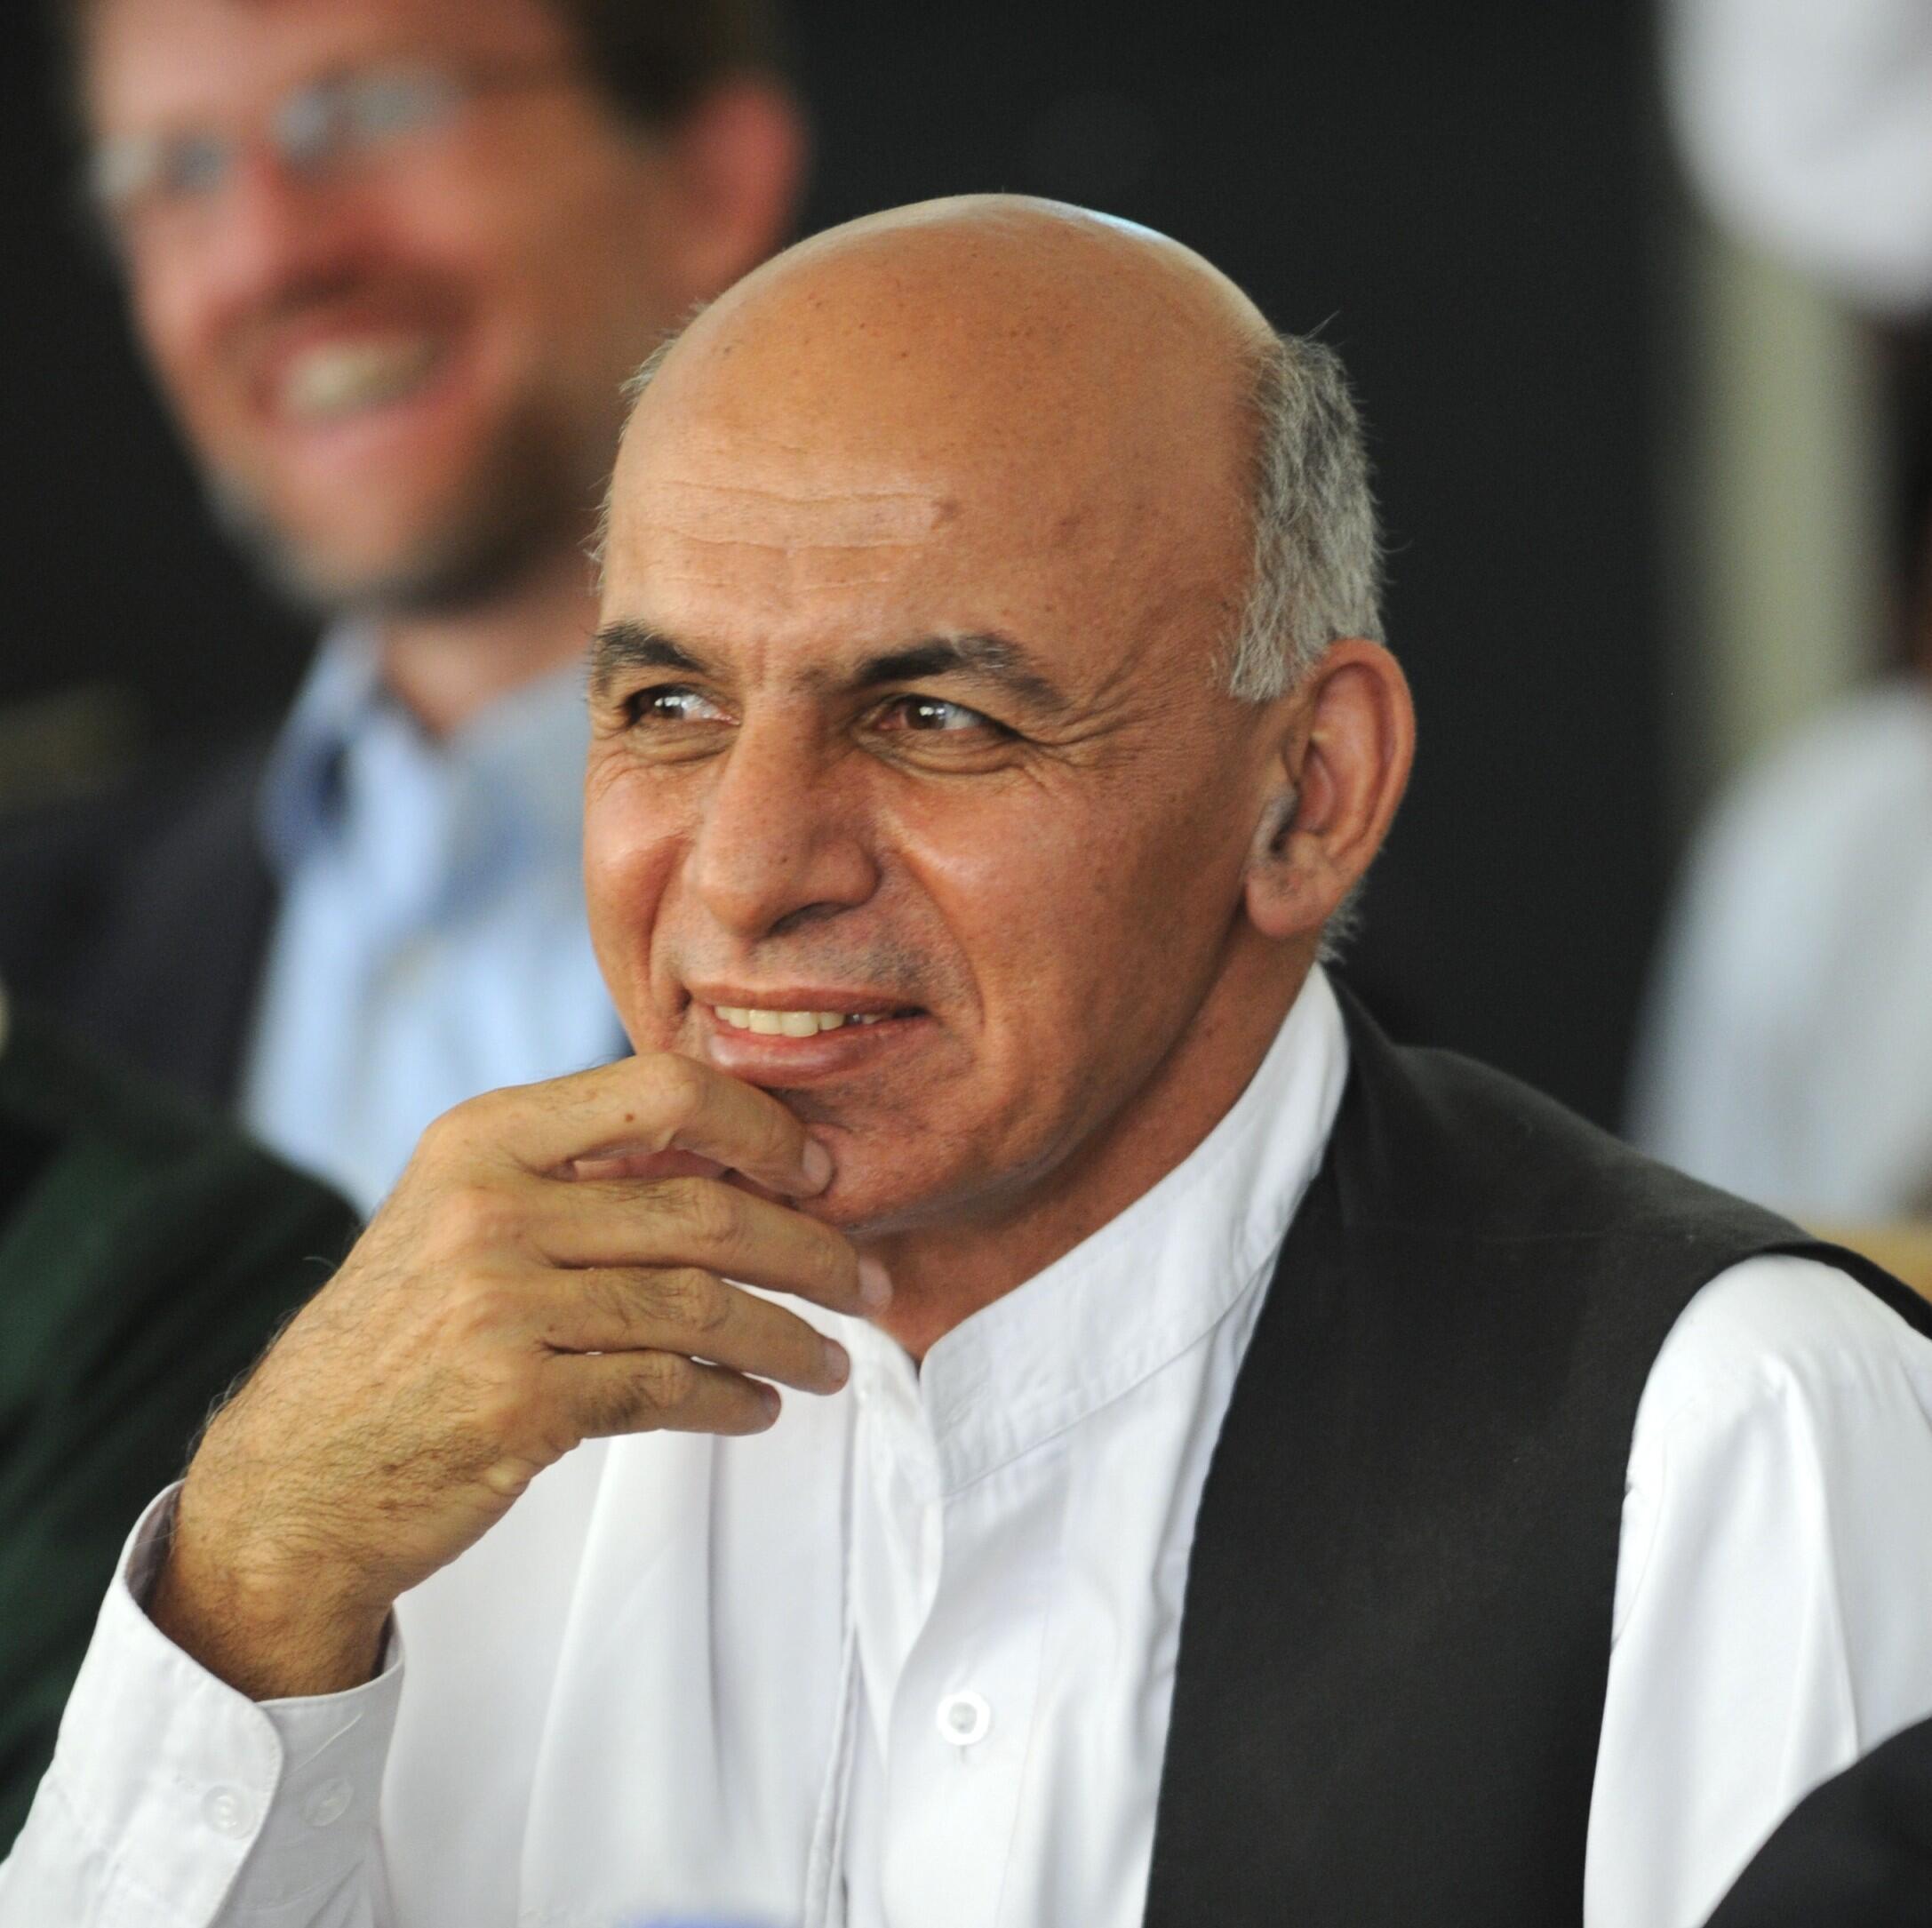 Ahraf Ghani